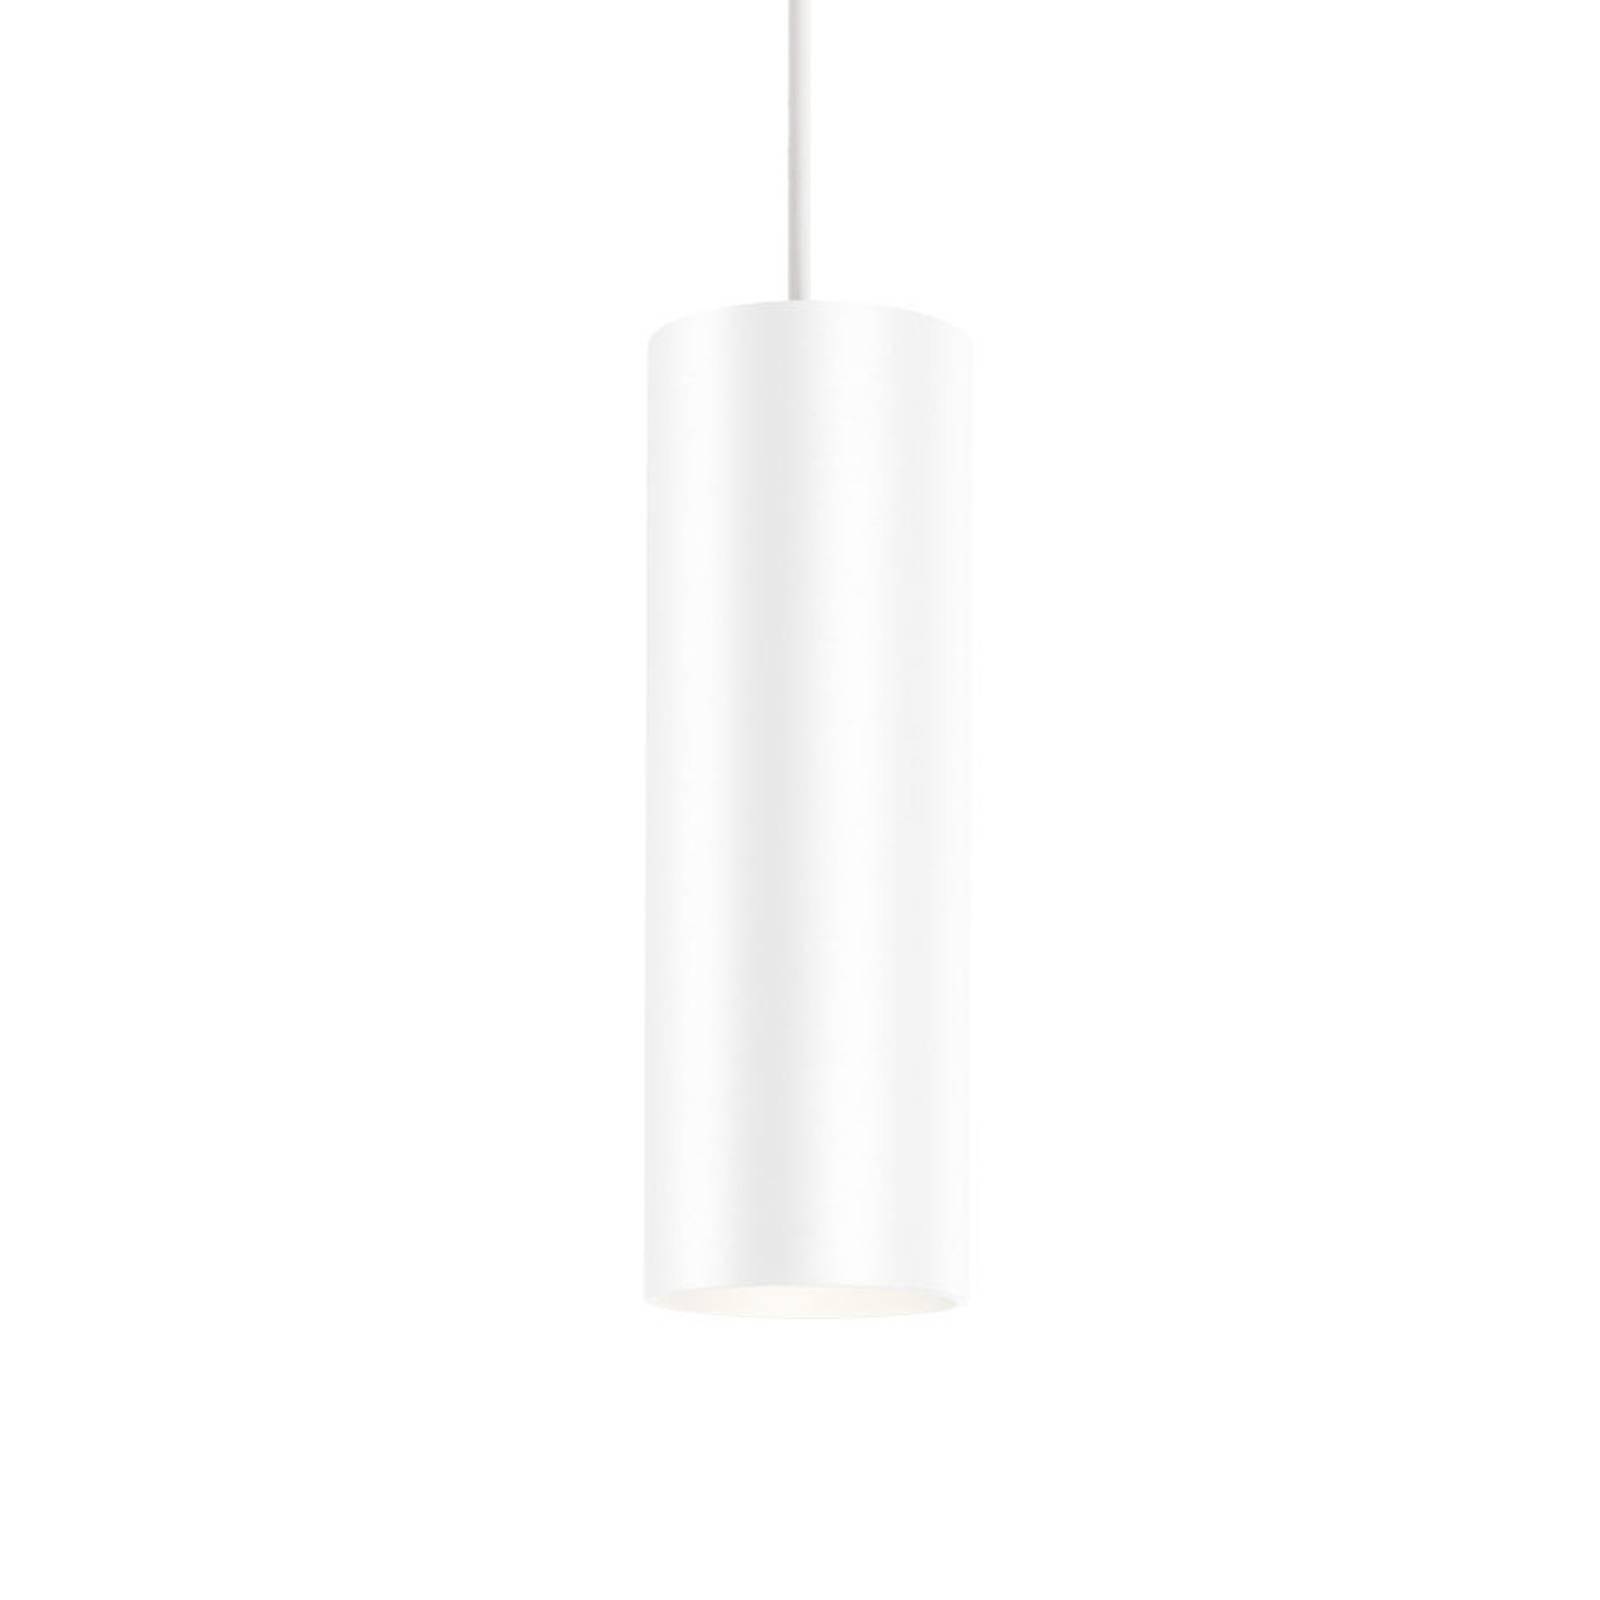 WEVER & DUCRÉ Ray 2.0 PAR16 Hängelampe weiß/weiß